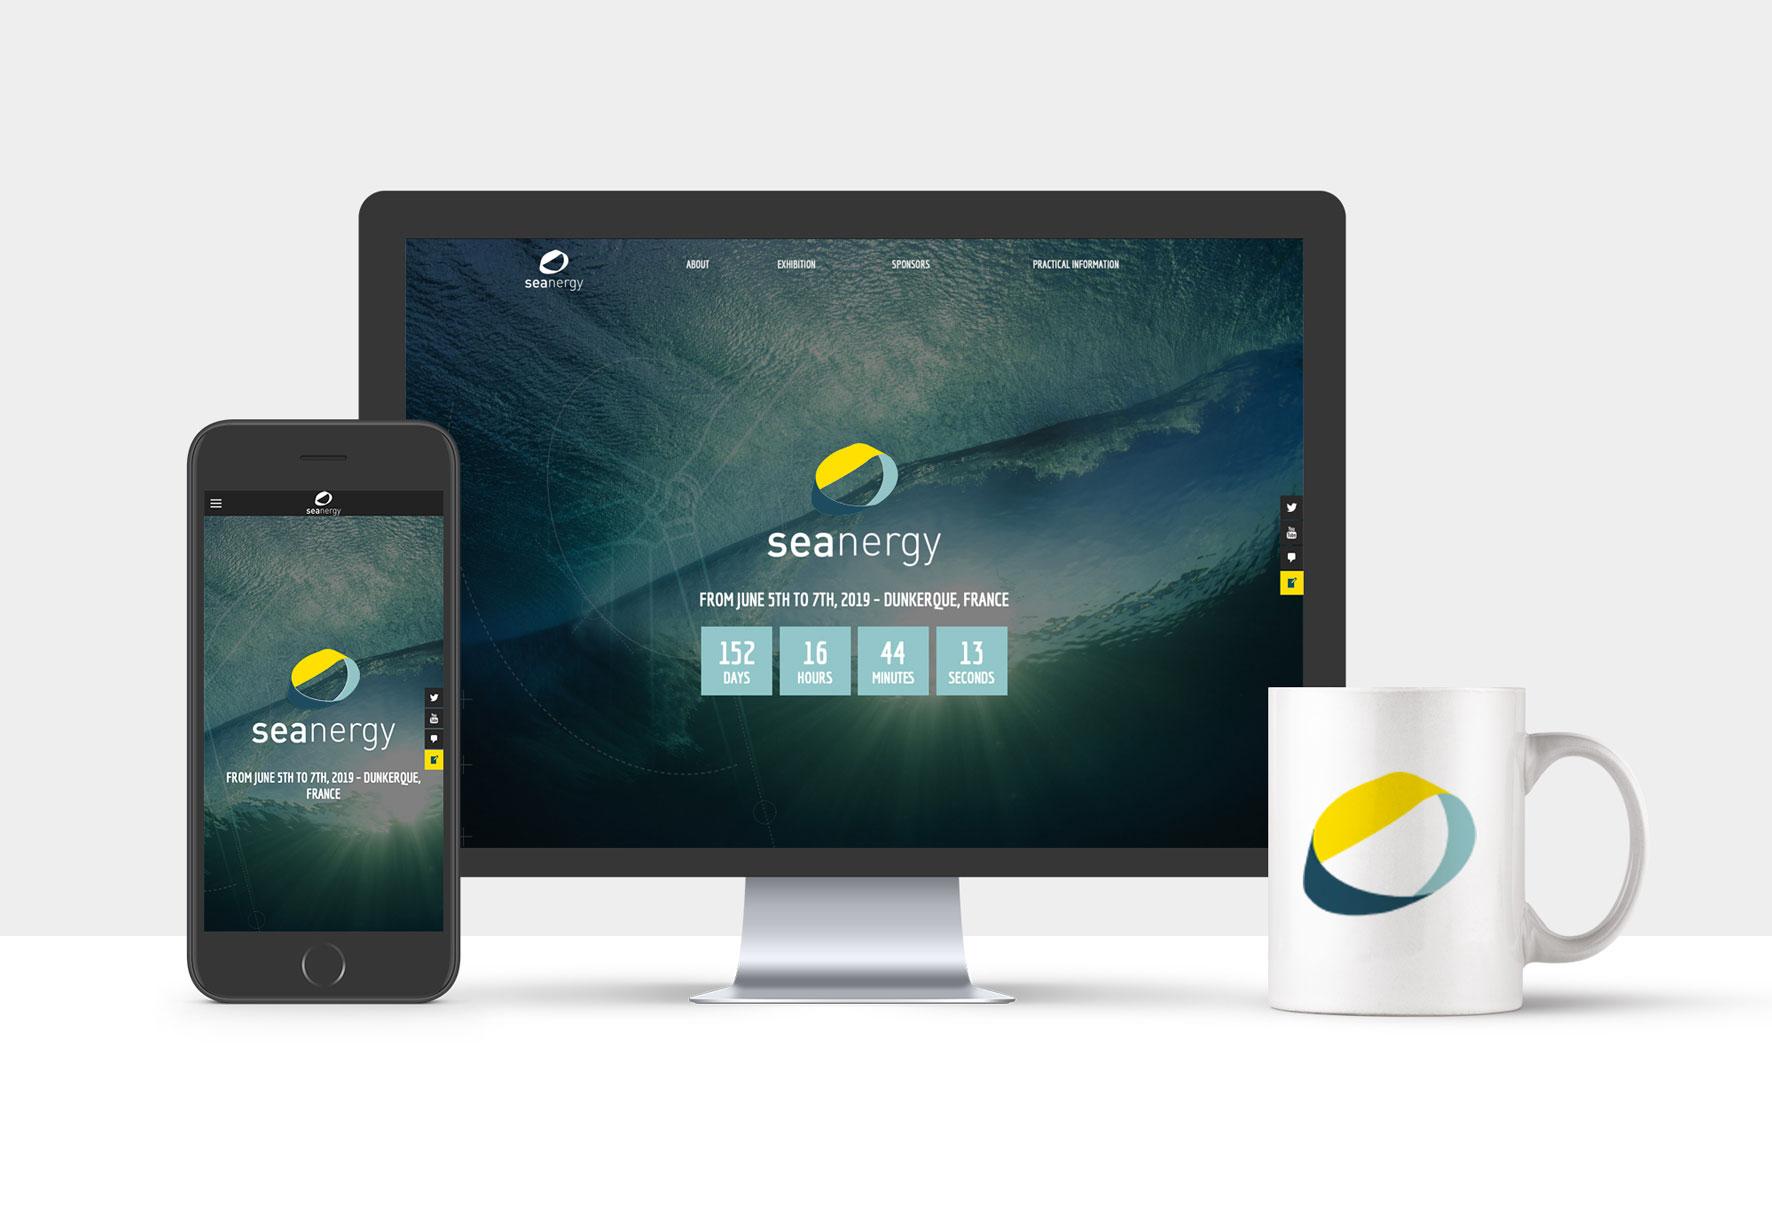 web-design-graphique-seanergy-site-web-idees_fraiches-copie